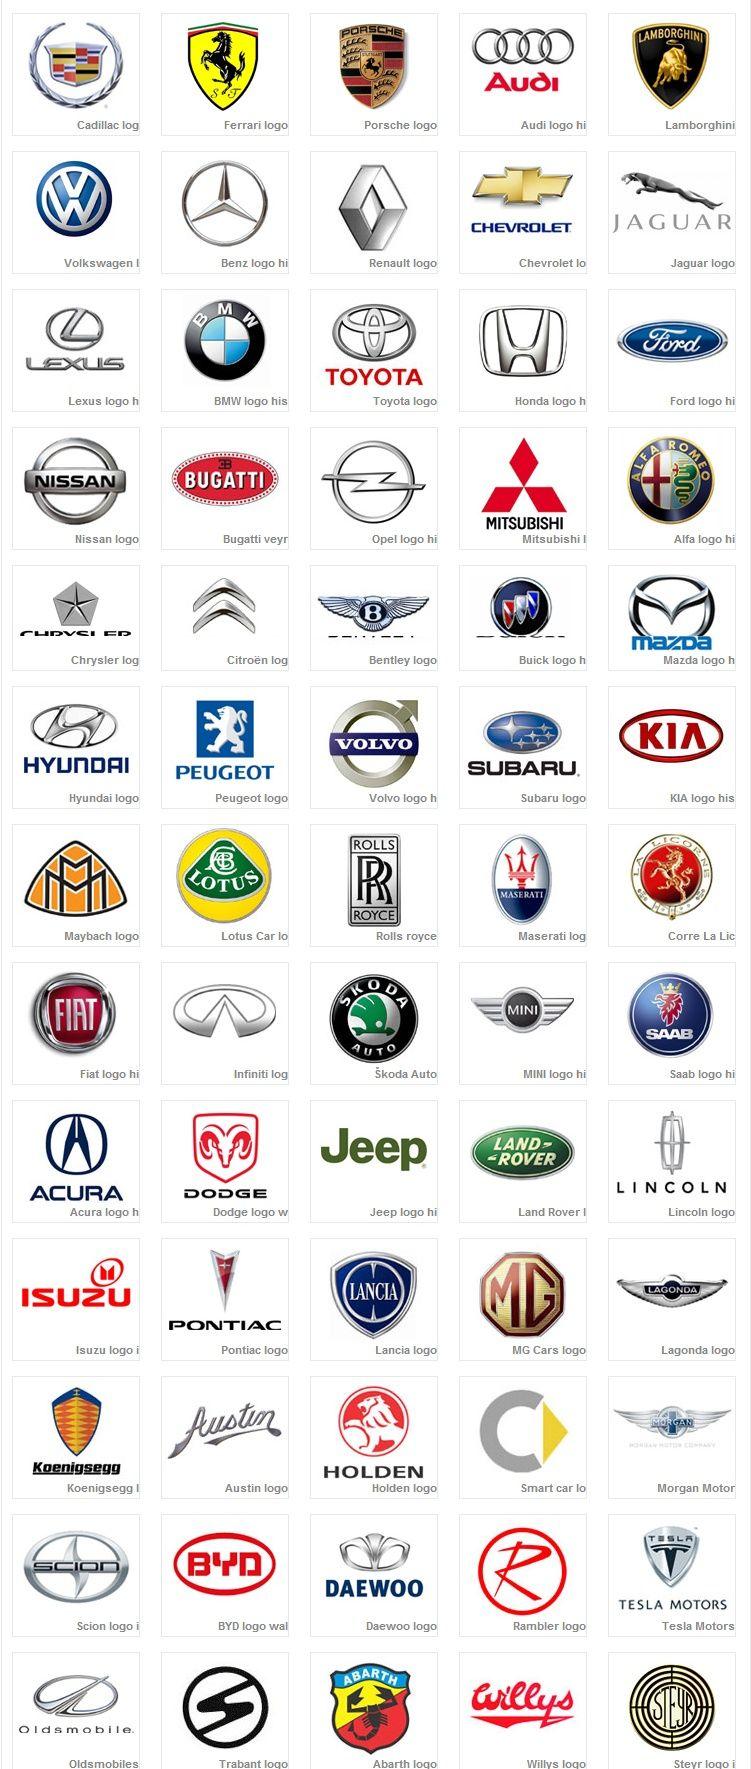 Car Brands Starting With H : brands, starting, Gregory, Carlson, (gregorycarlsonu), Symbols,, Brands, Logos,